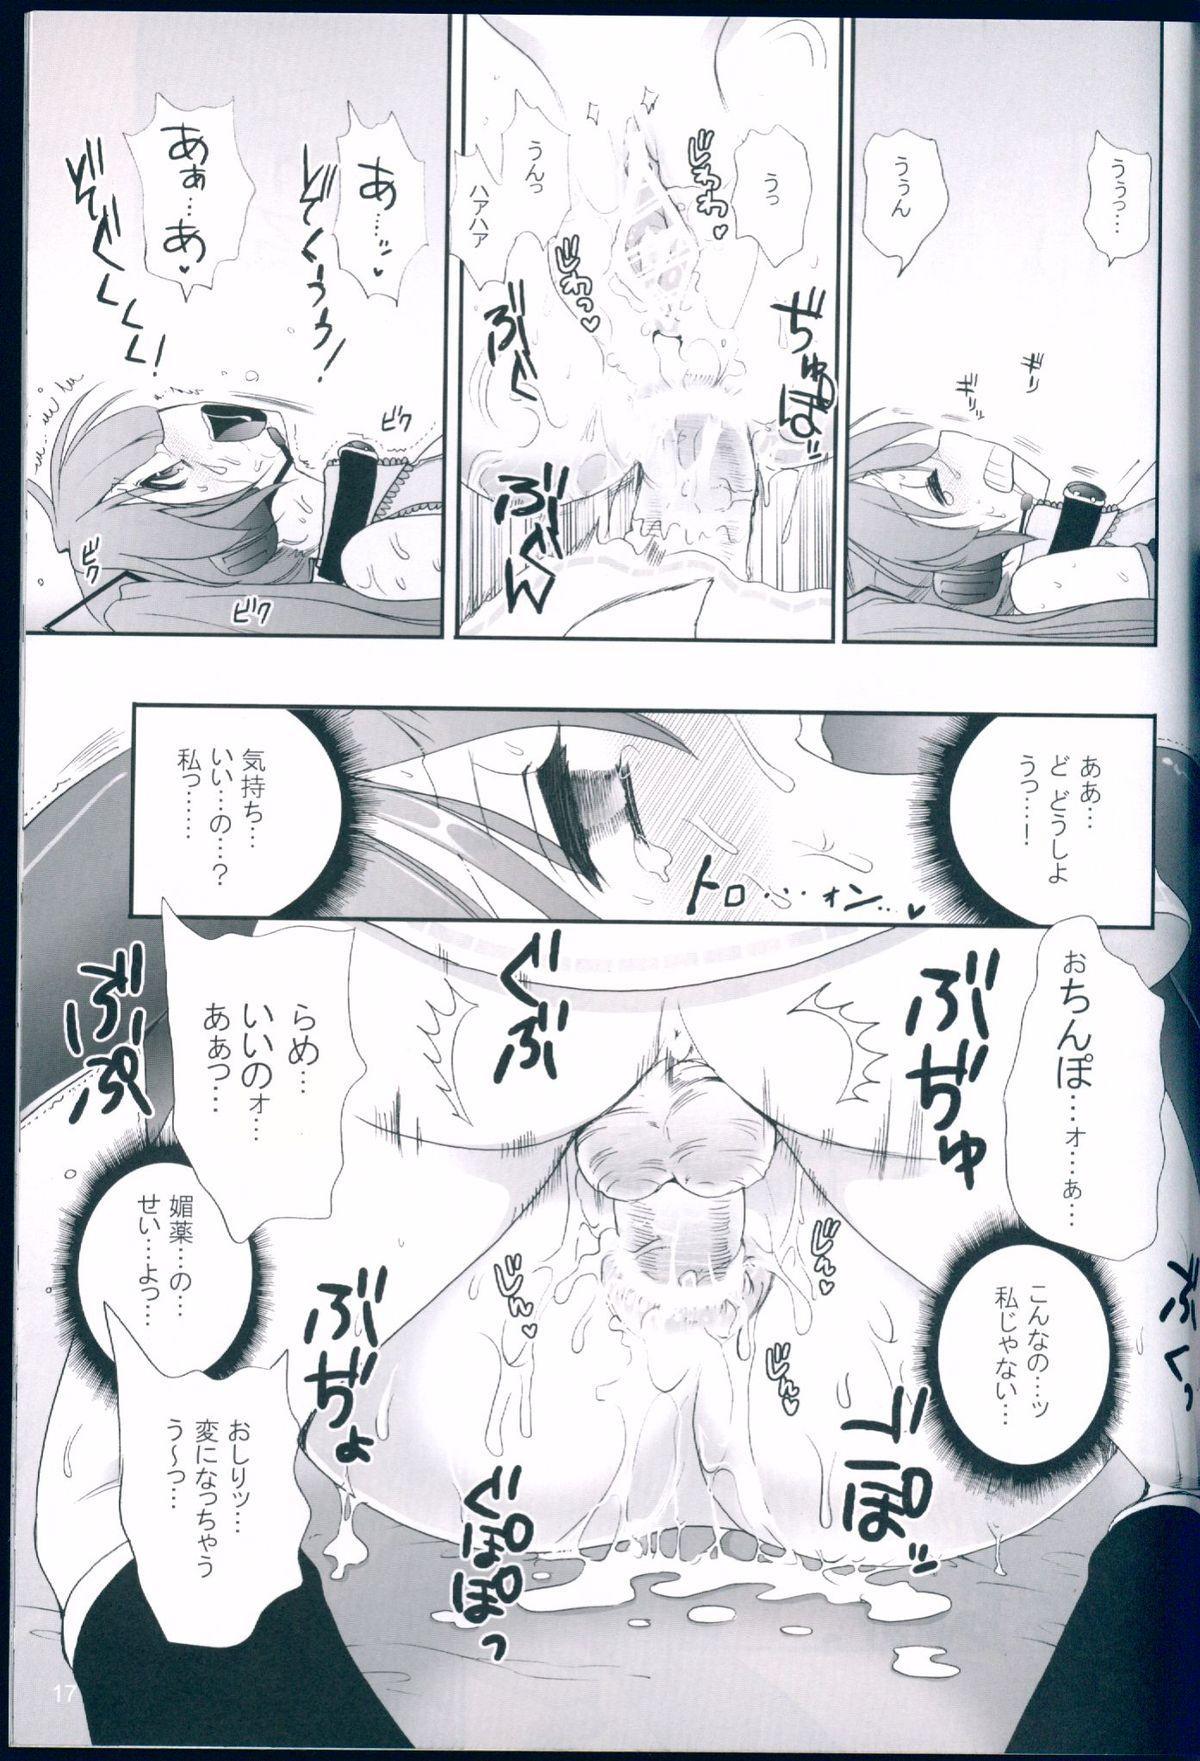 R Juu - Hatsune Miku Kenkan 16